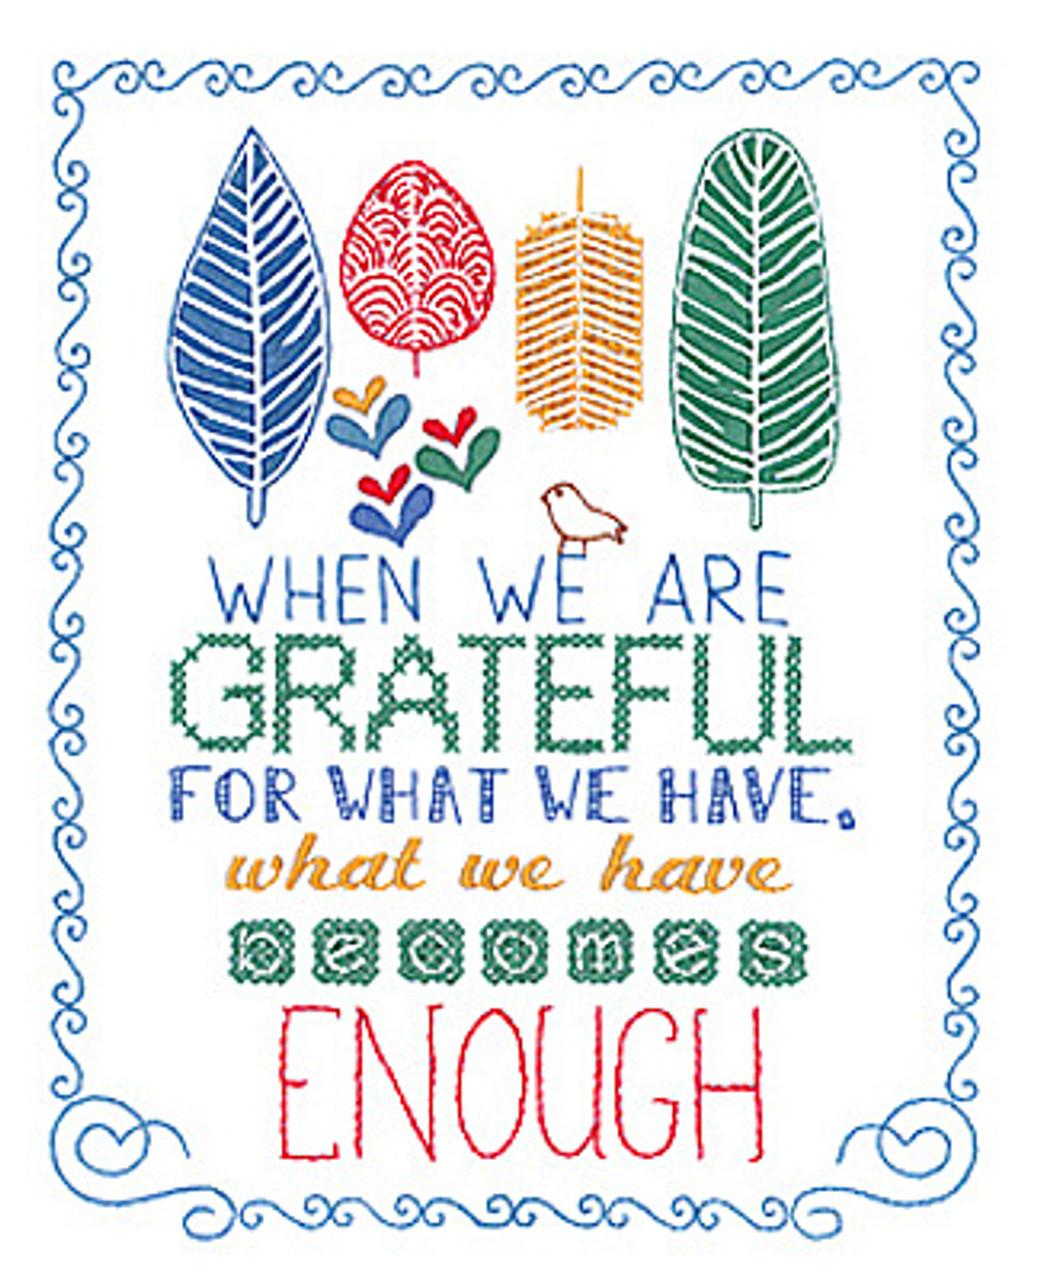 Janlynn - Grateful